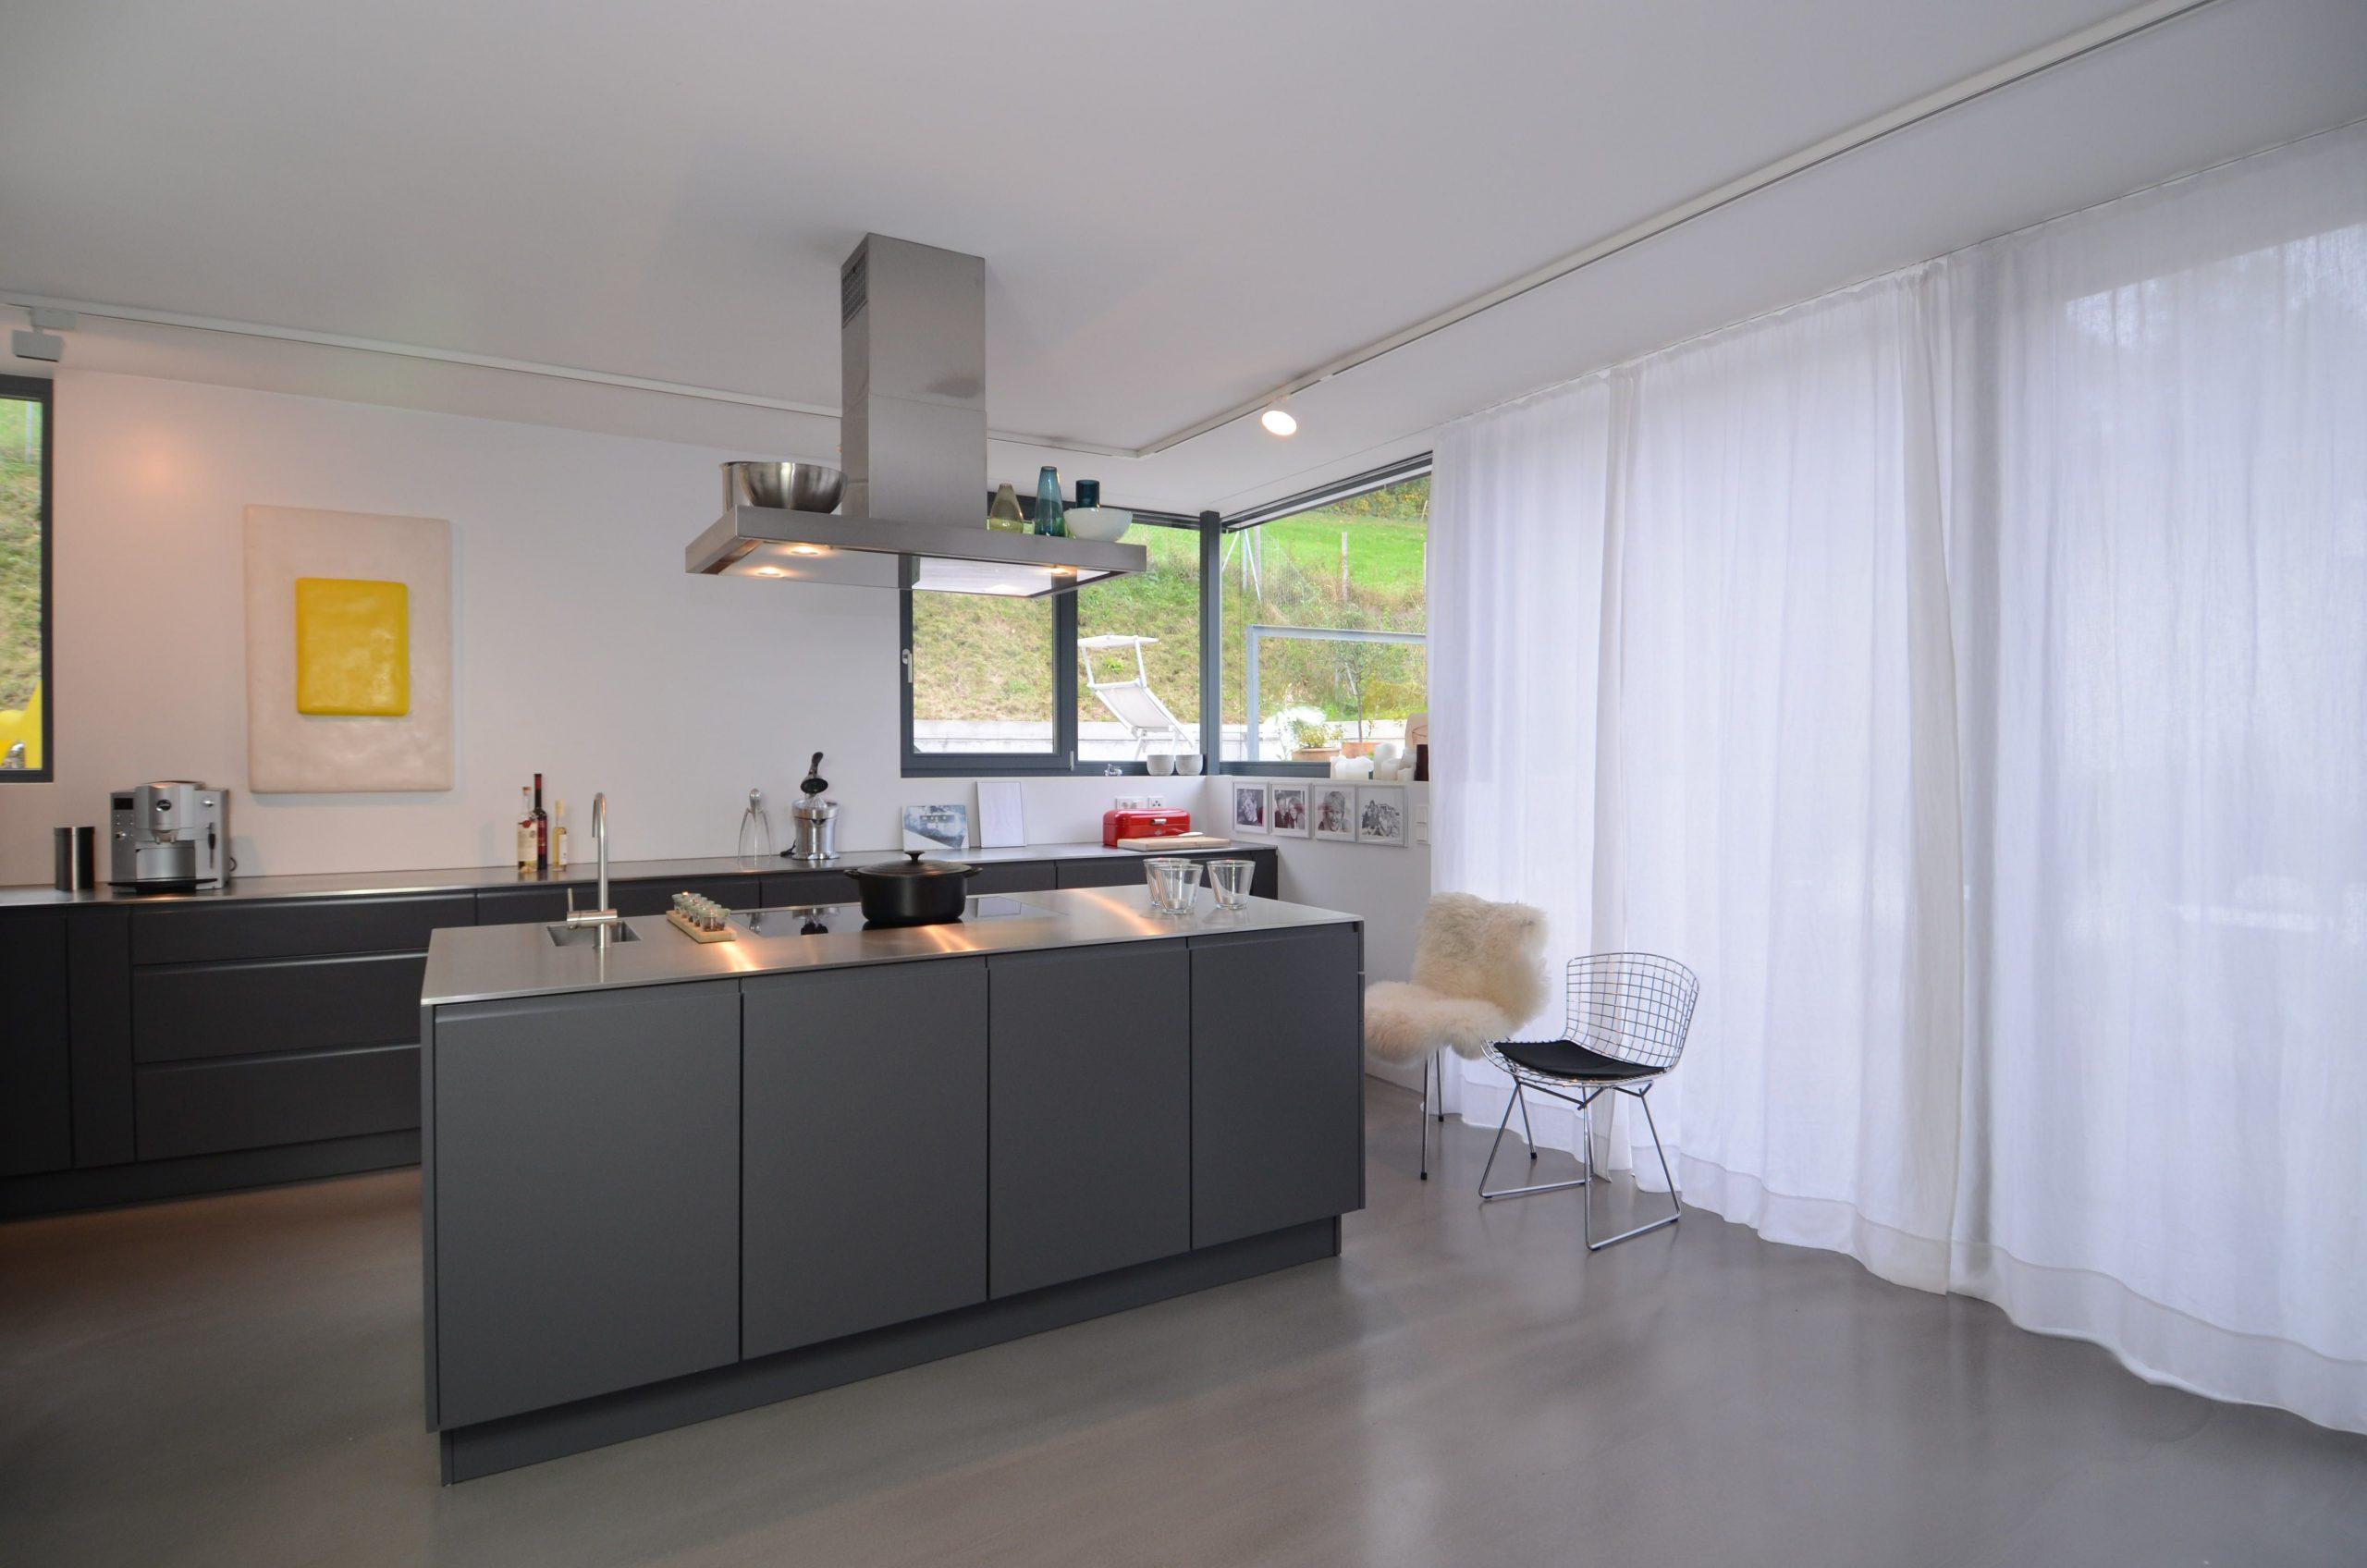 Single kochen freiburg